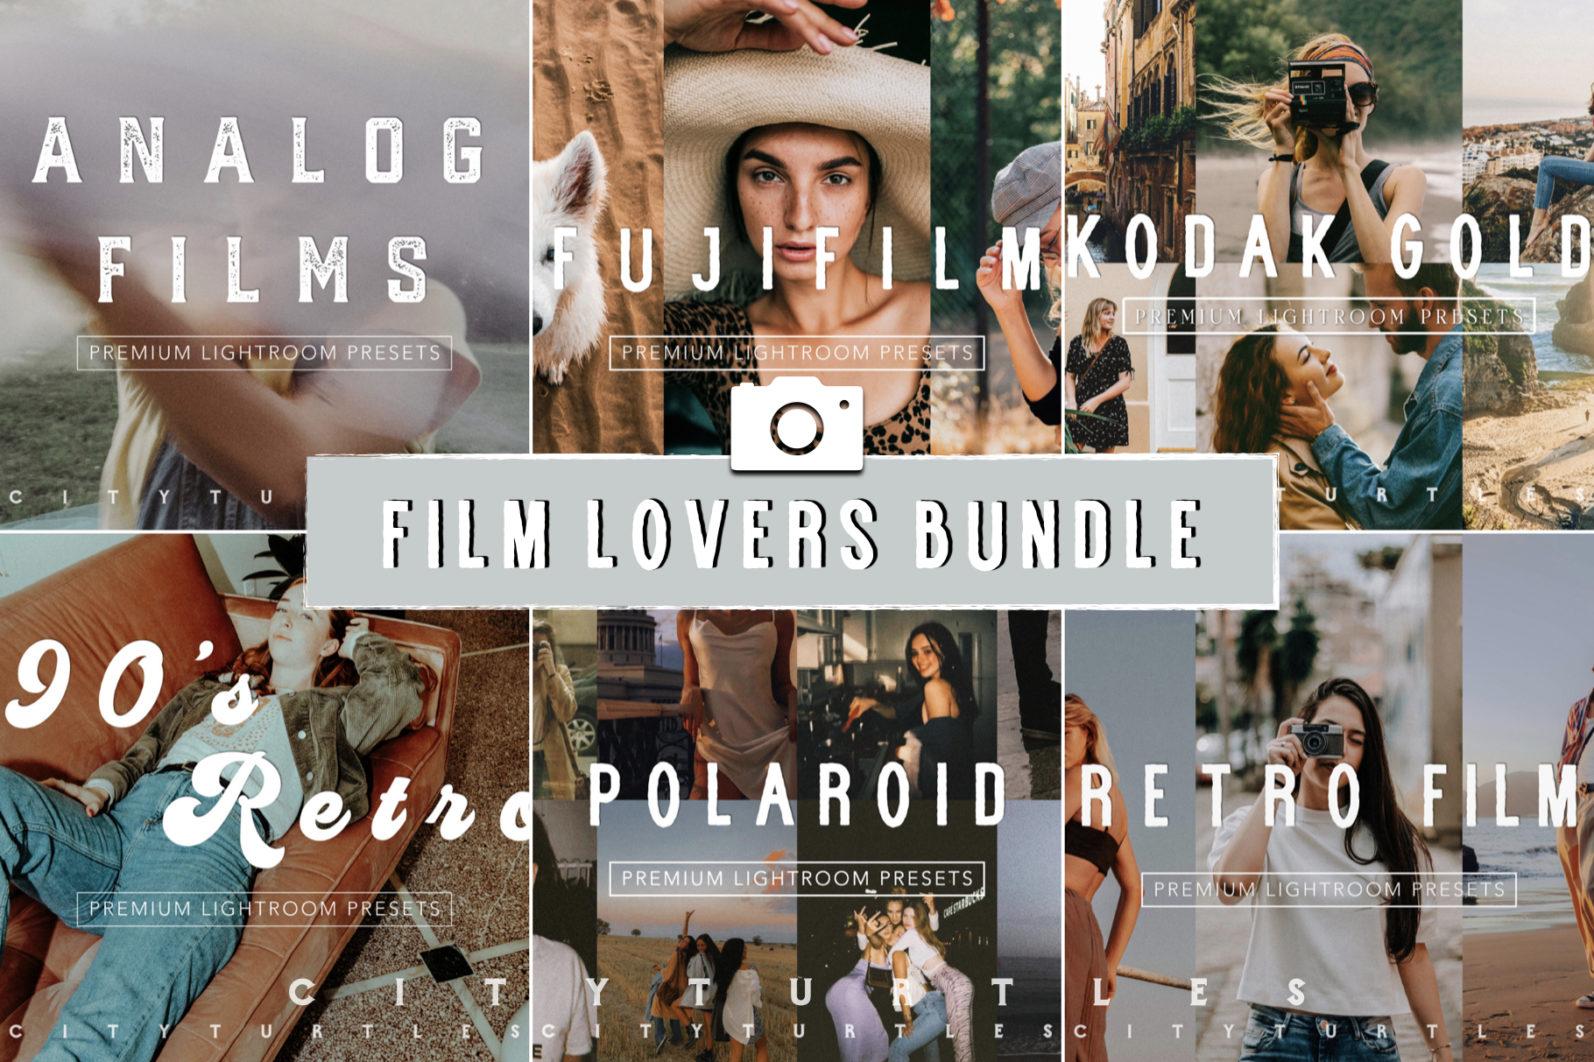 FILM LOVERS BUNDLE Lightroom Presets for Desktop & Mobile - Premium Photography Editing Tools - film lovers lightroom preset bundle -